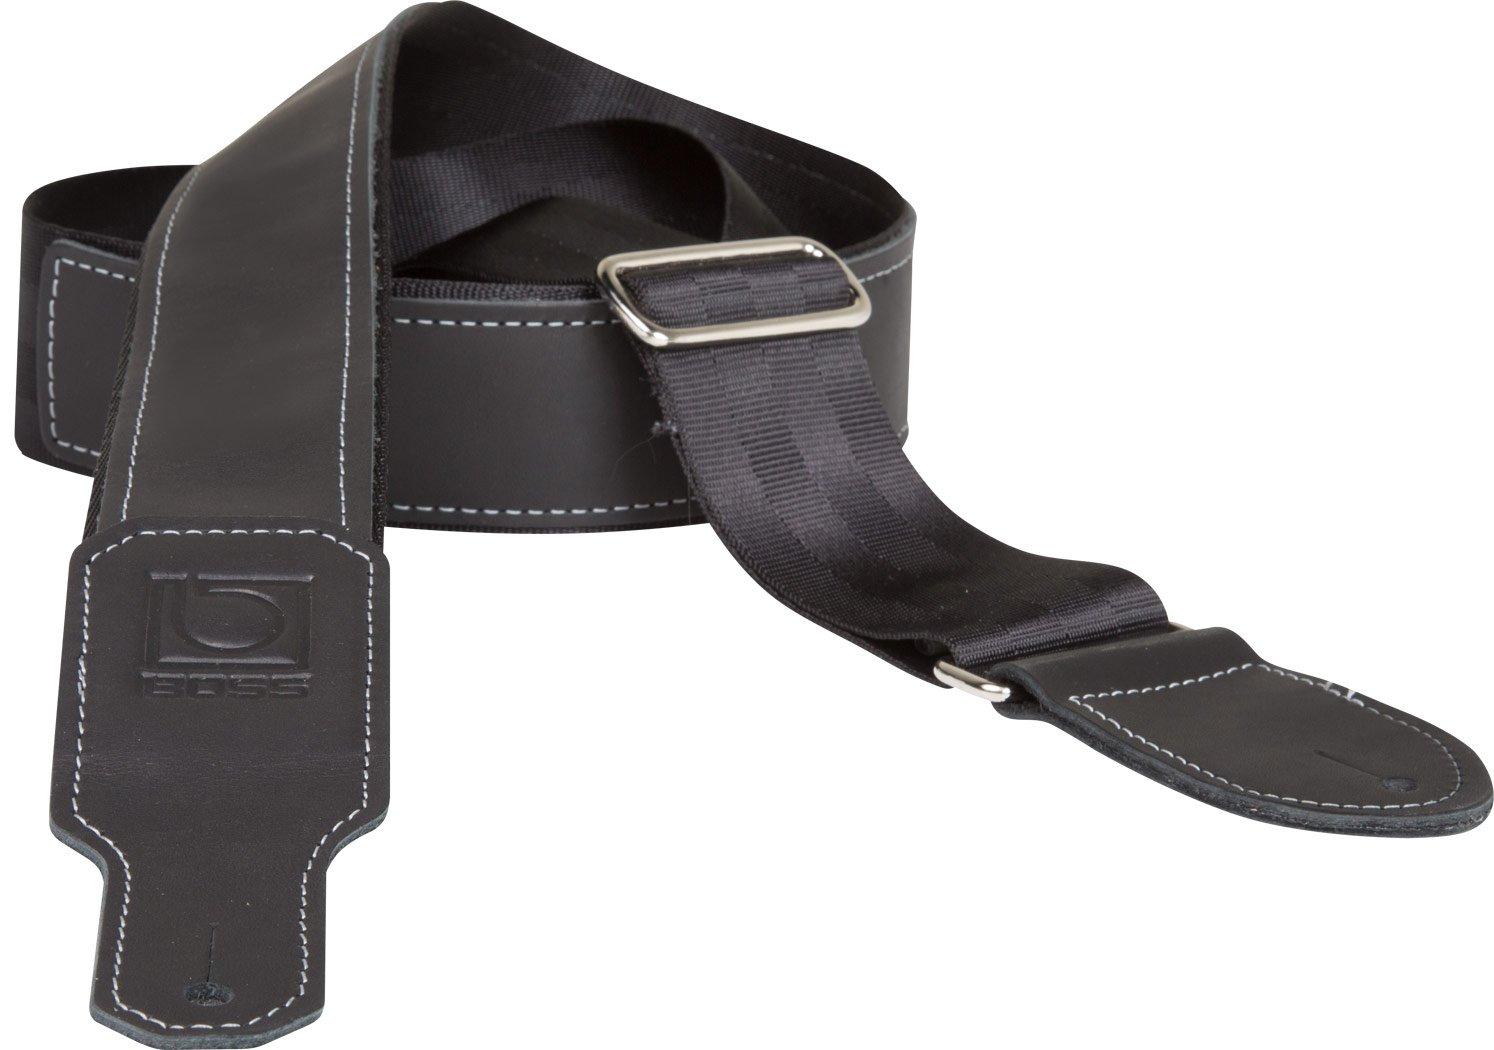 Boss 2 Hybrid Leather/Seatbelt Geetar Strap